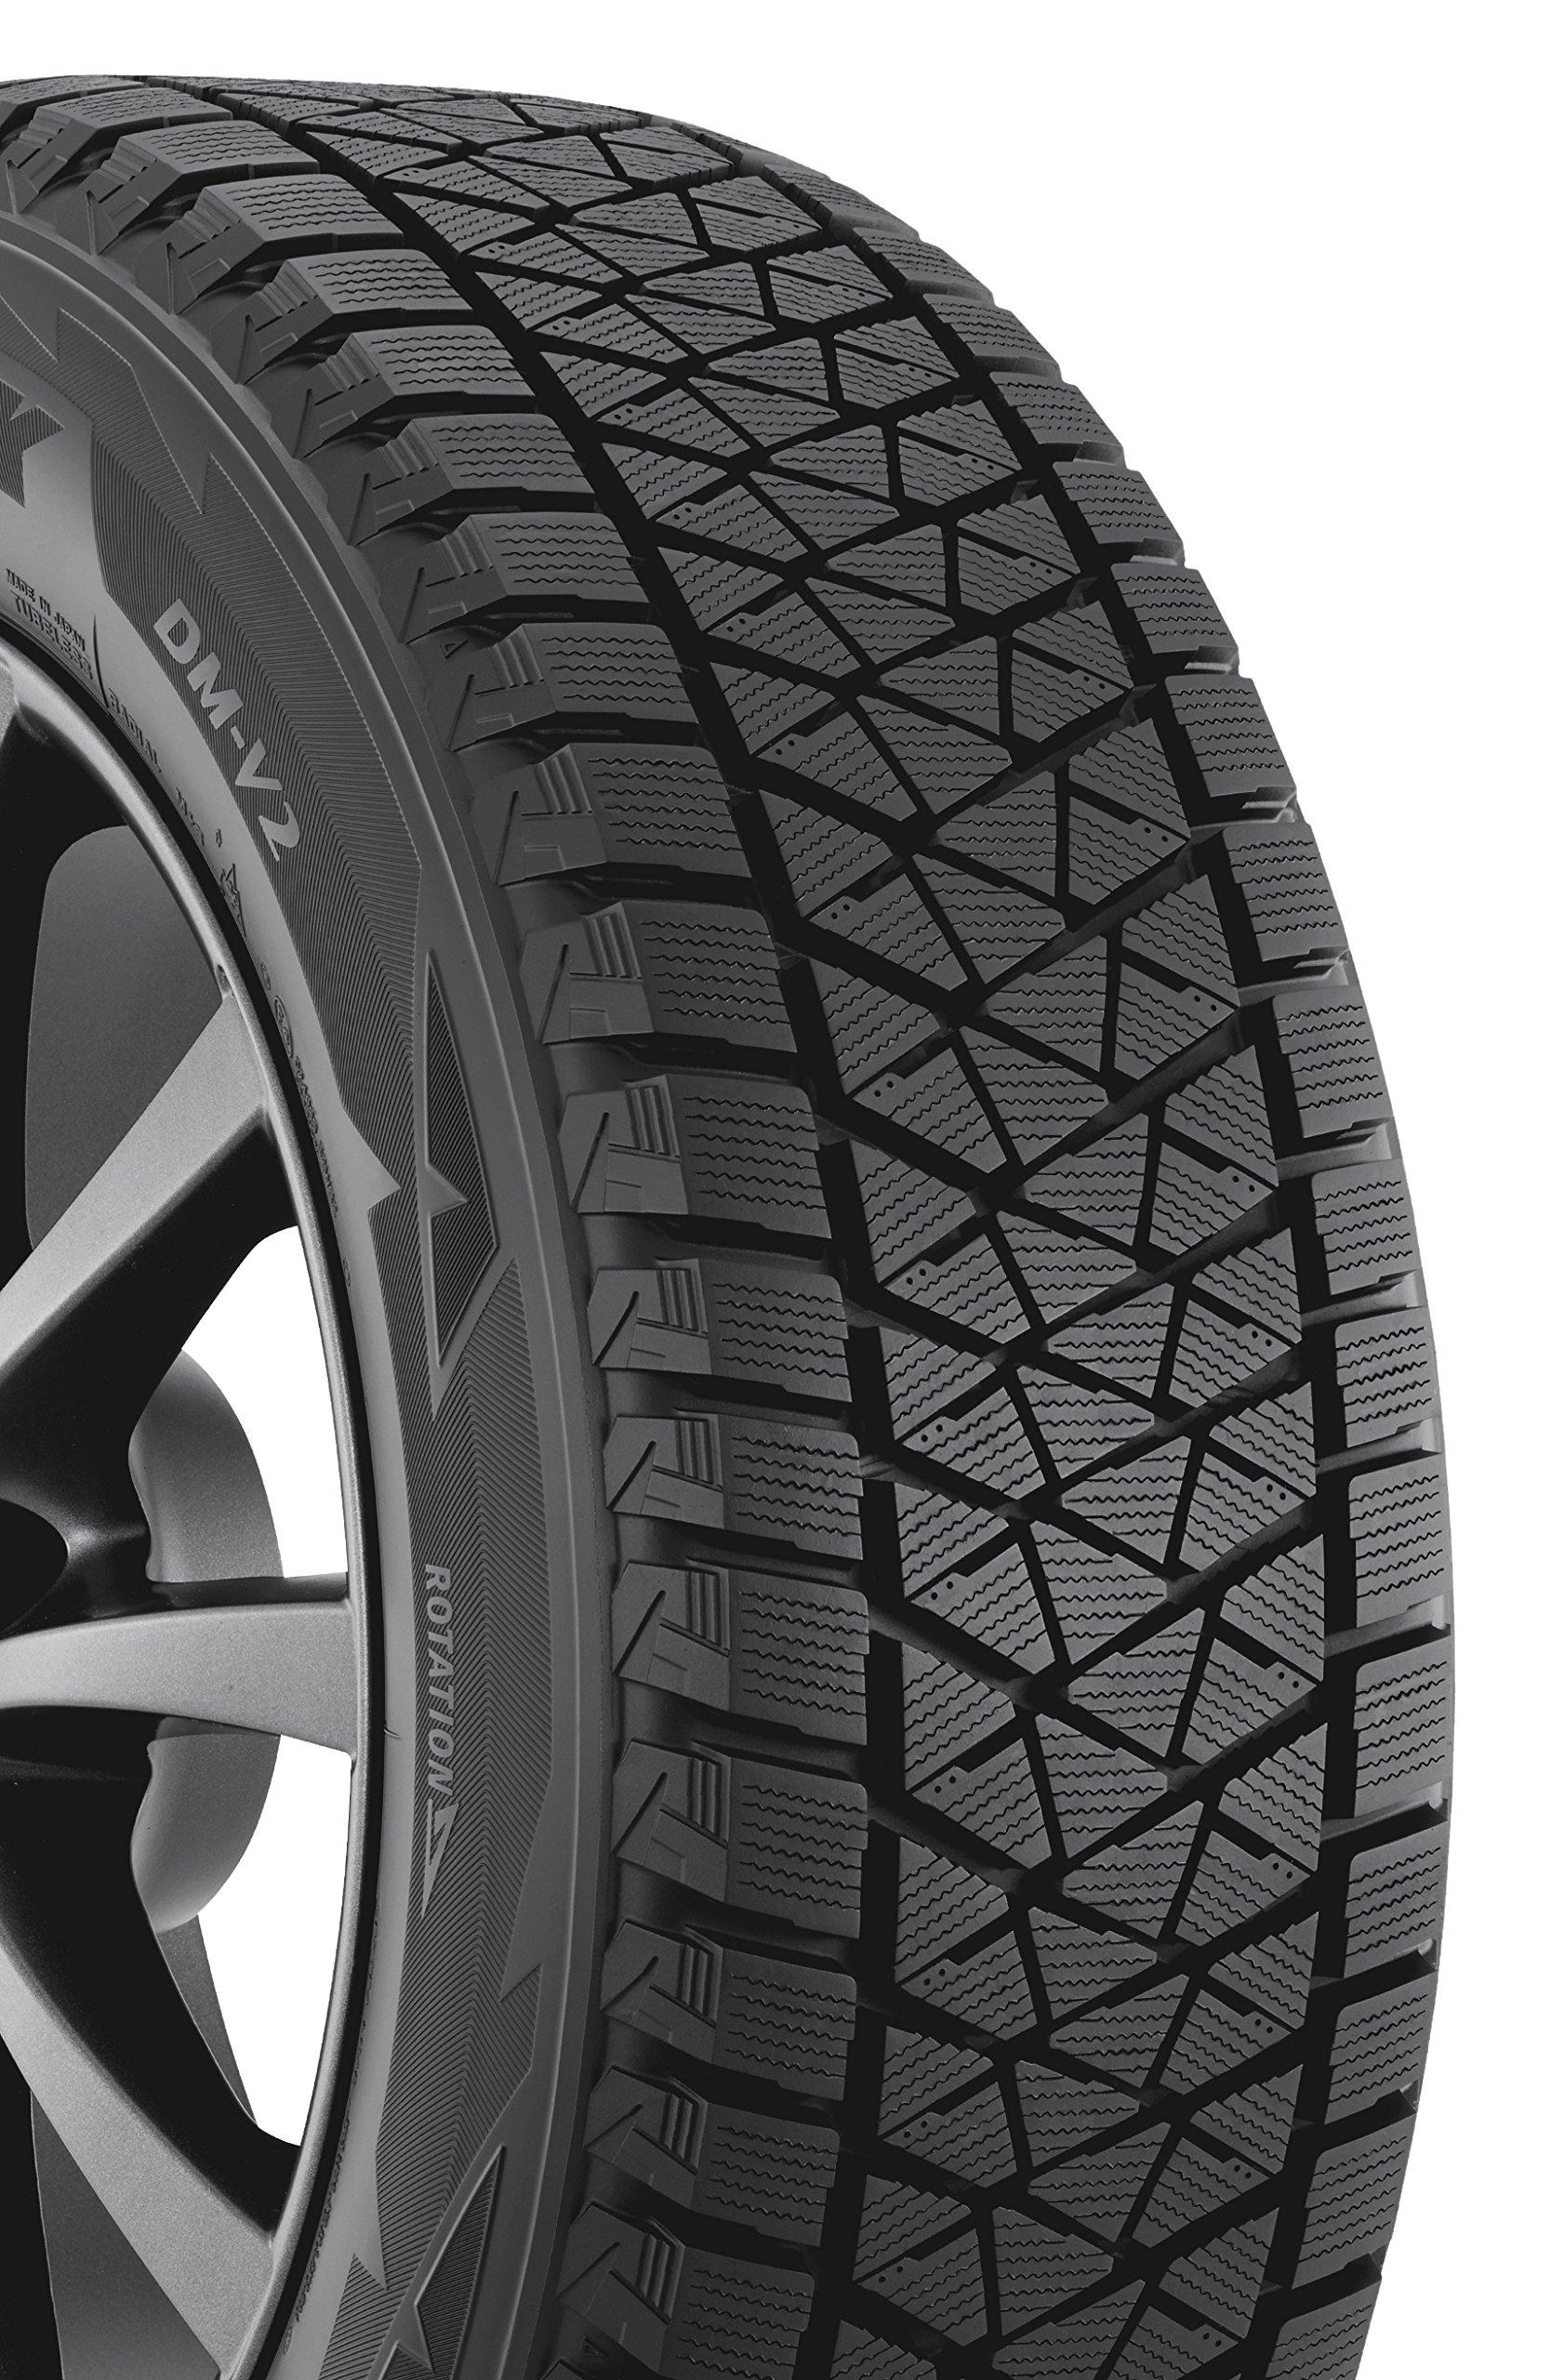 Bridgestone BLIZZAK DM-V2 Winter Radial Tire - 255/55R18 109T by Bridgestone